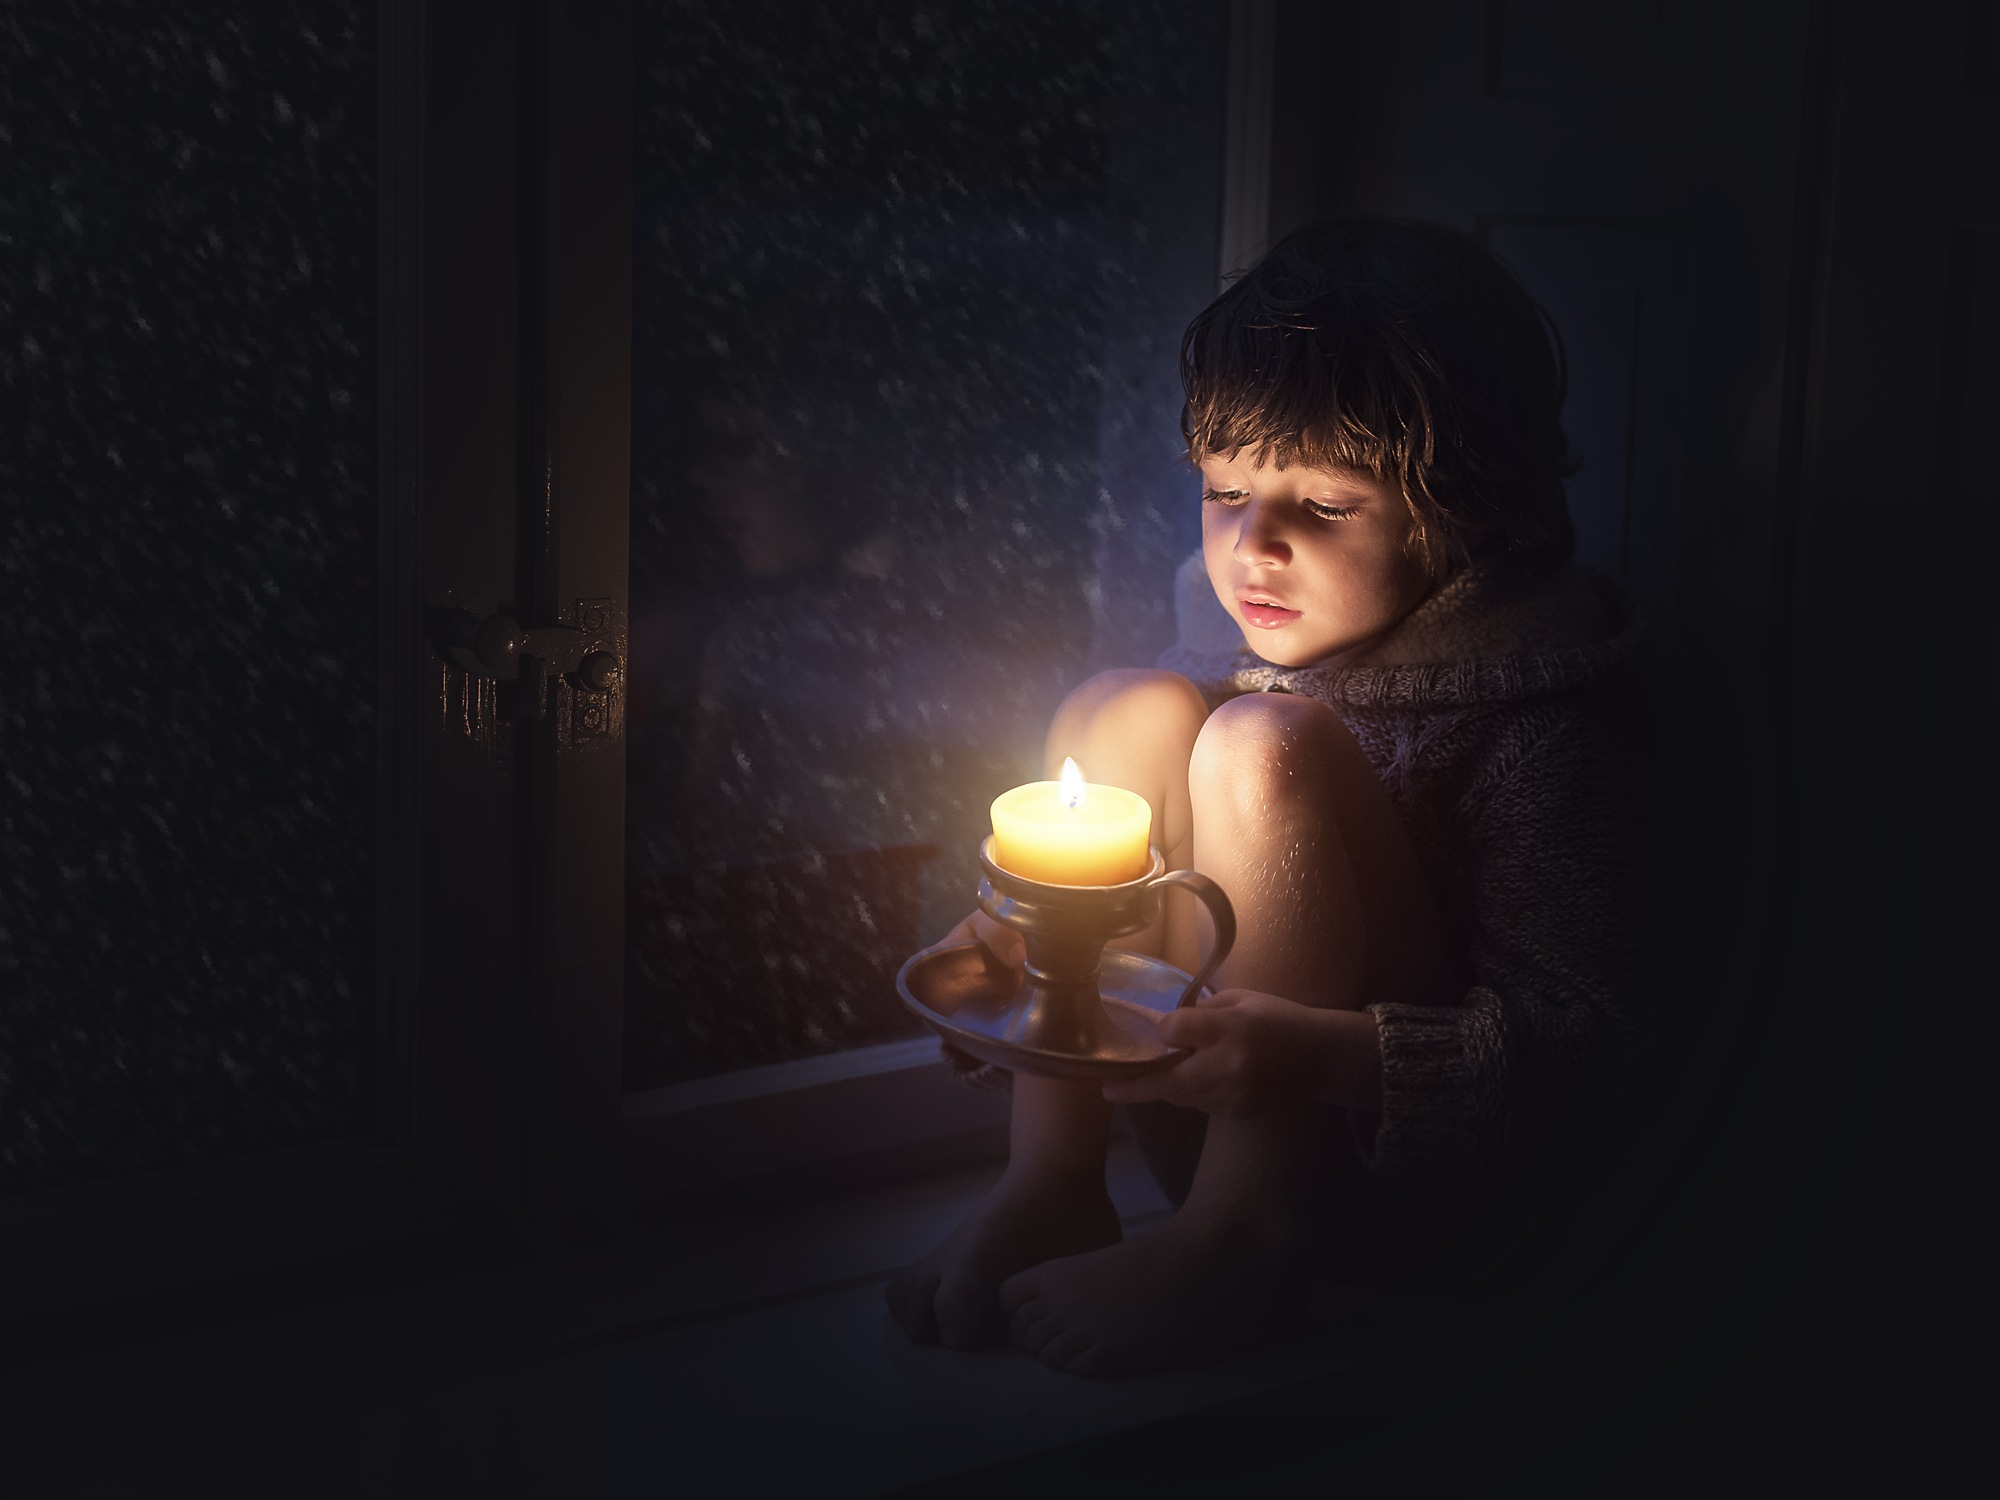 Waiting for Santa by Marlena Kasprzak